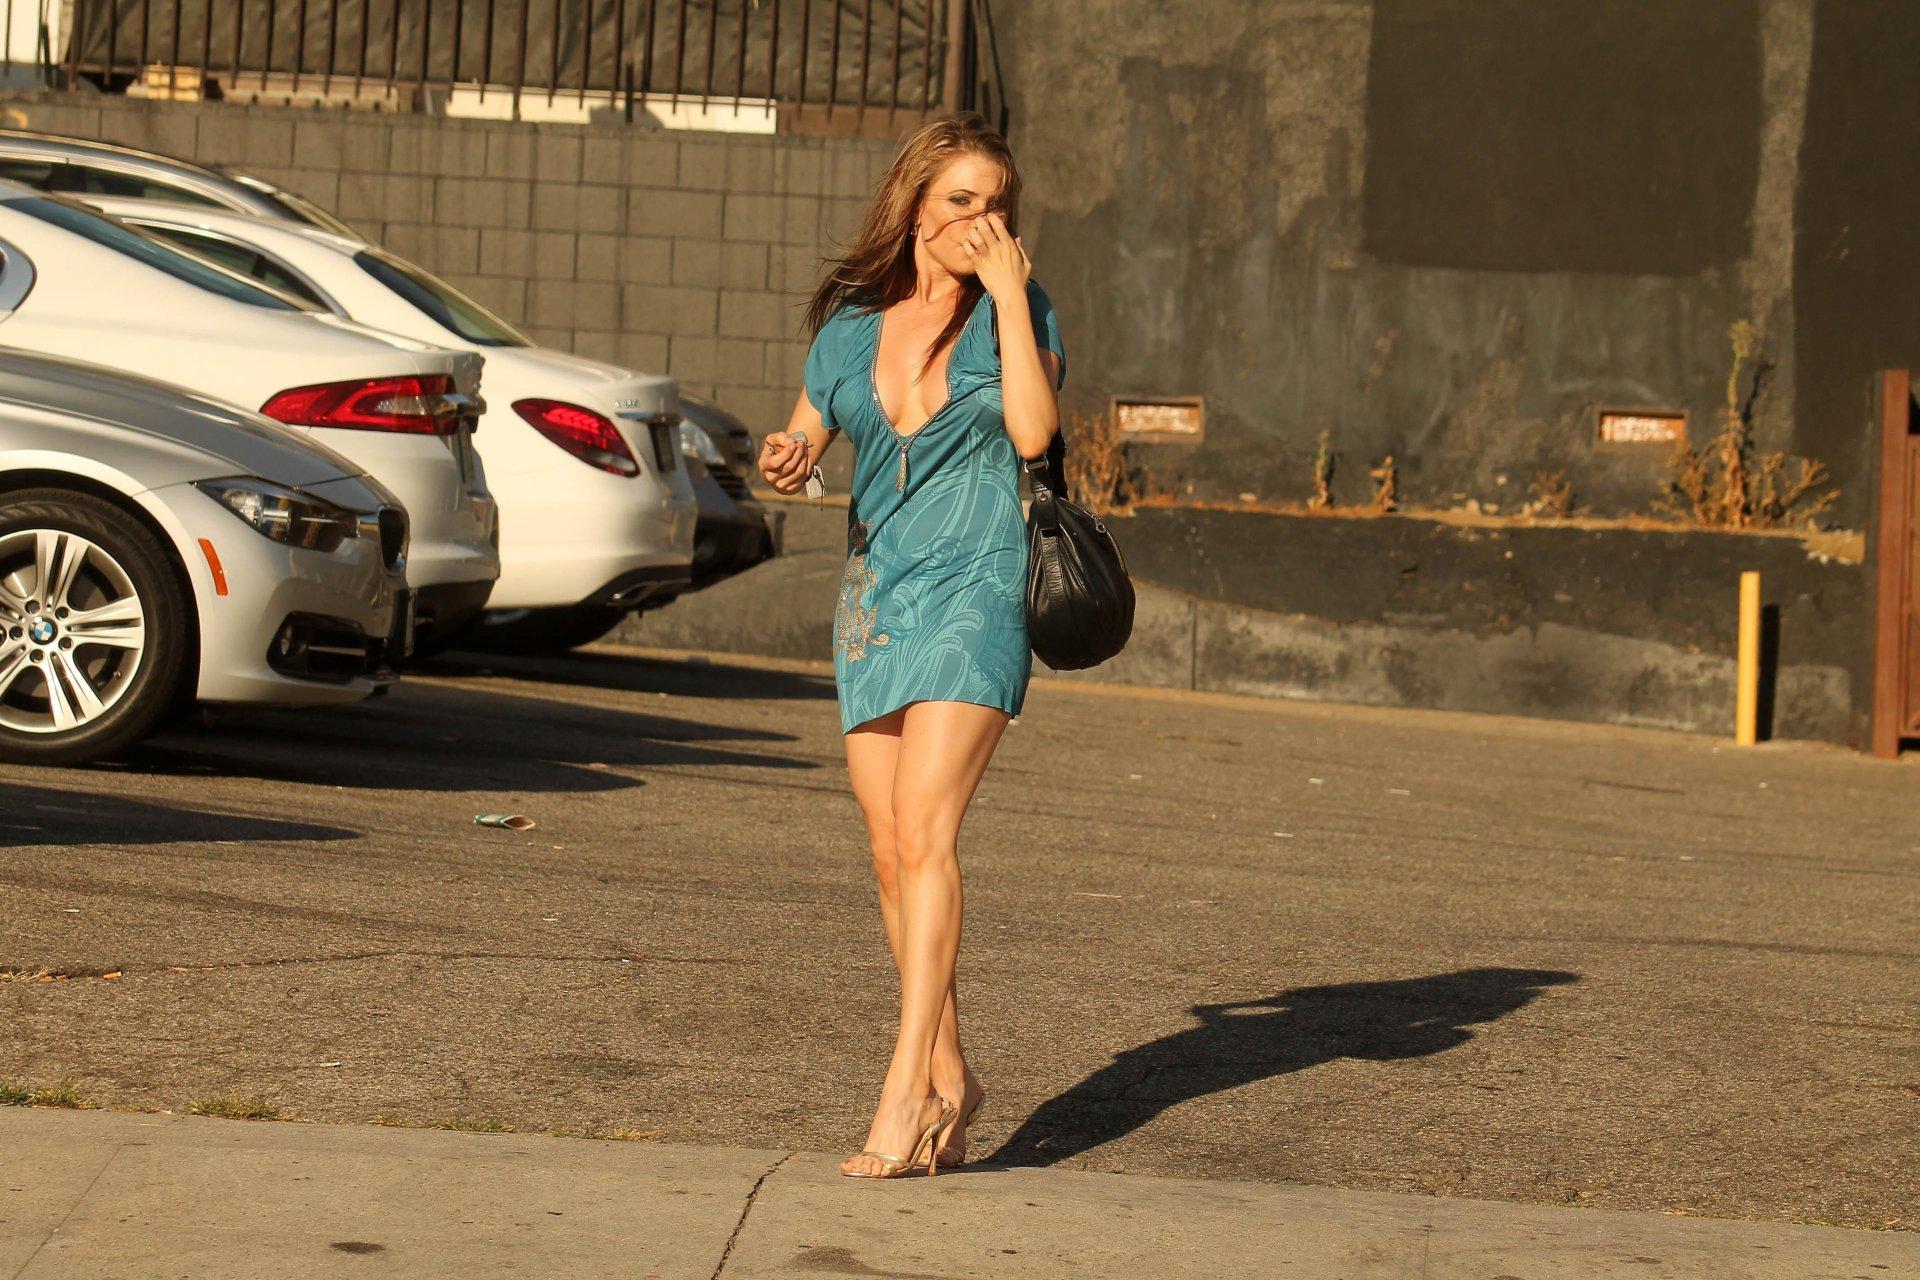 Erika jordan upskirt boob flash nude (72 photo)